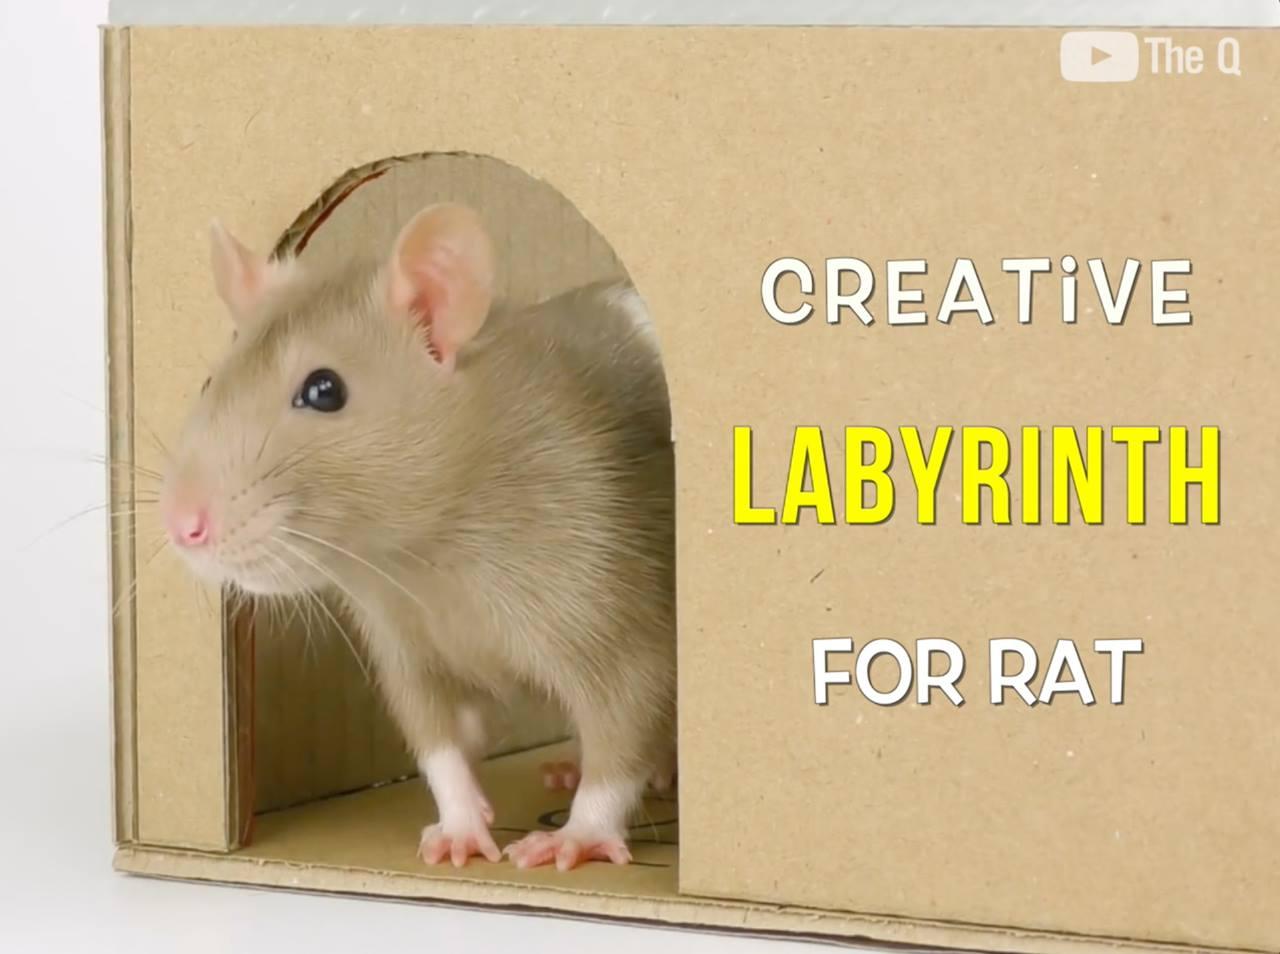 Built Labyrinth for Rat